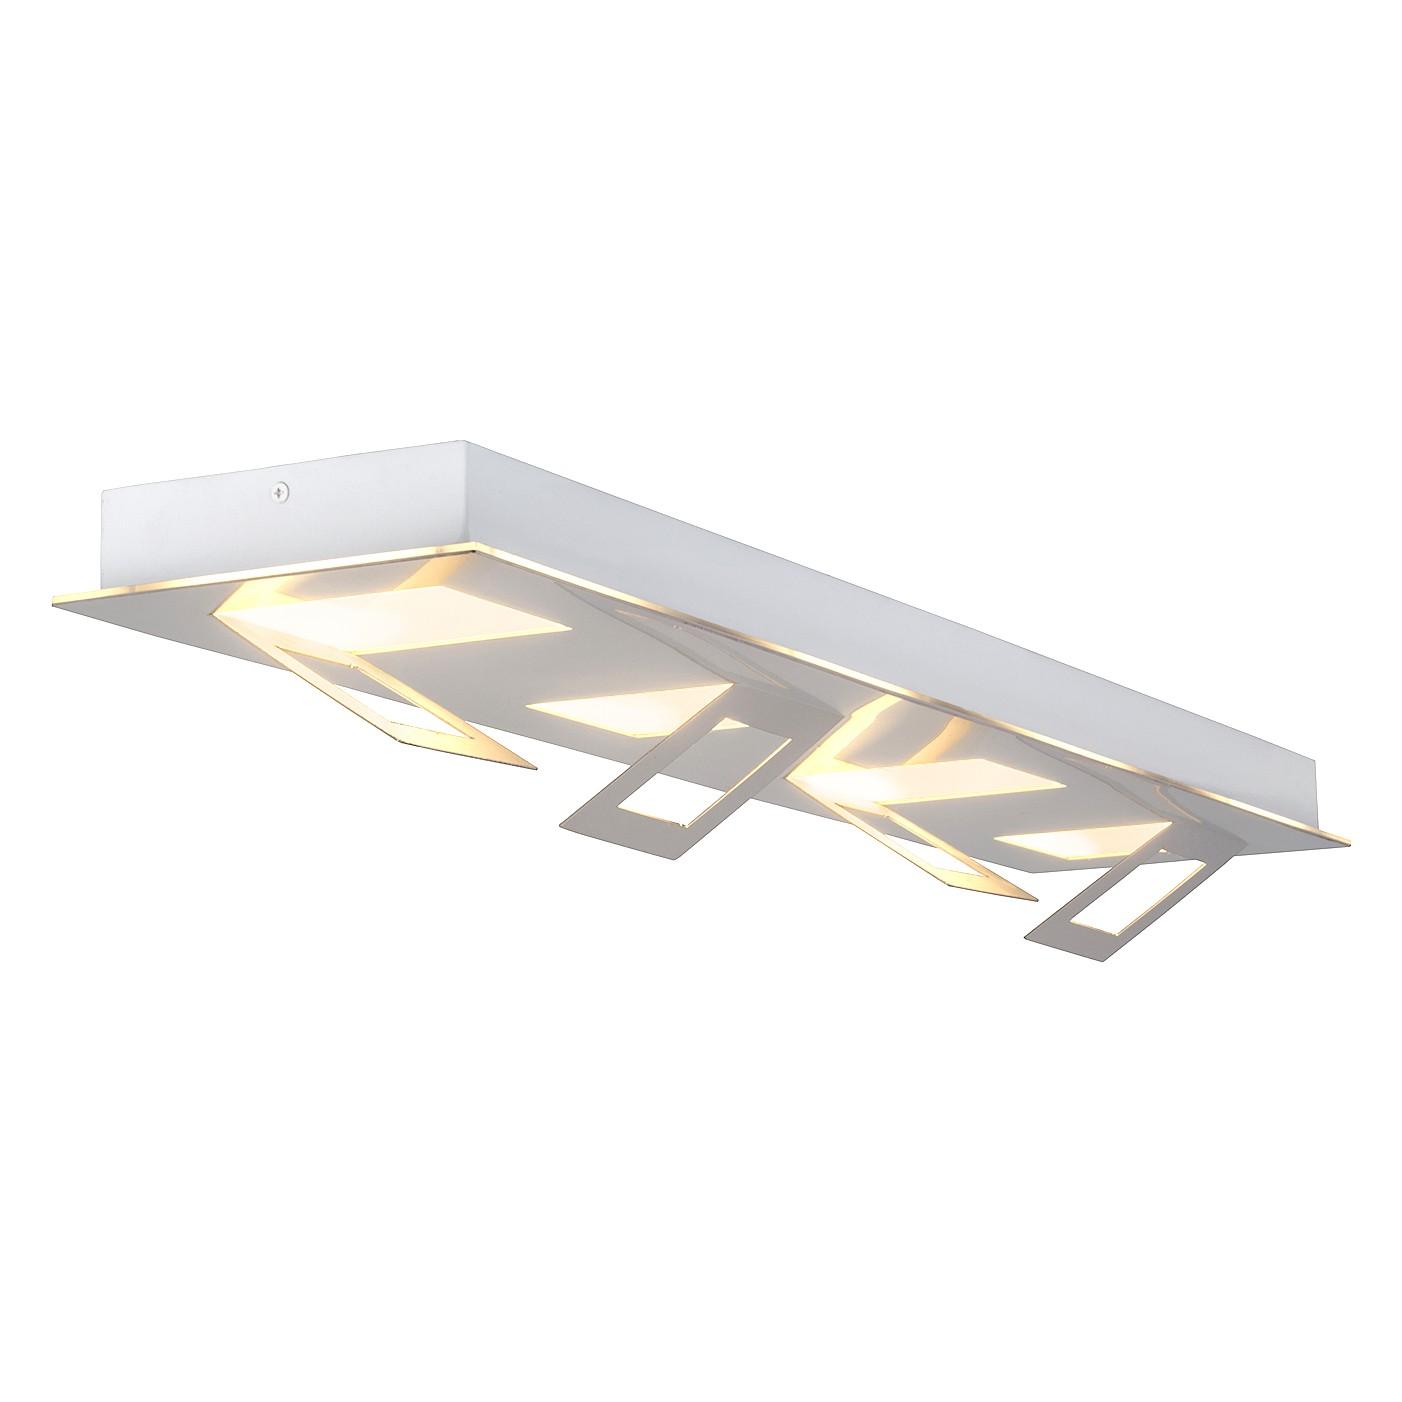 home24 LED-Deckenleuchte Doors I